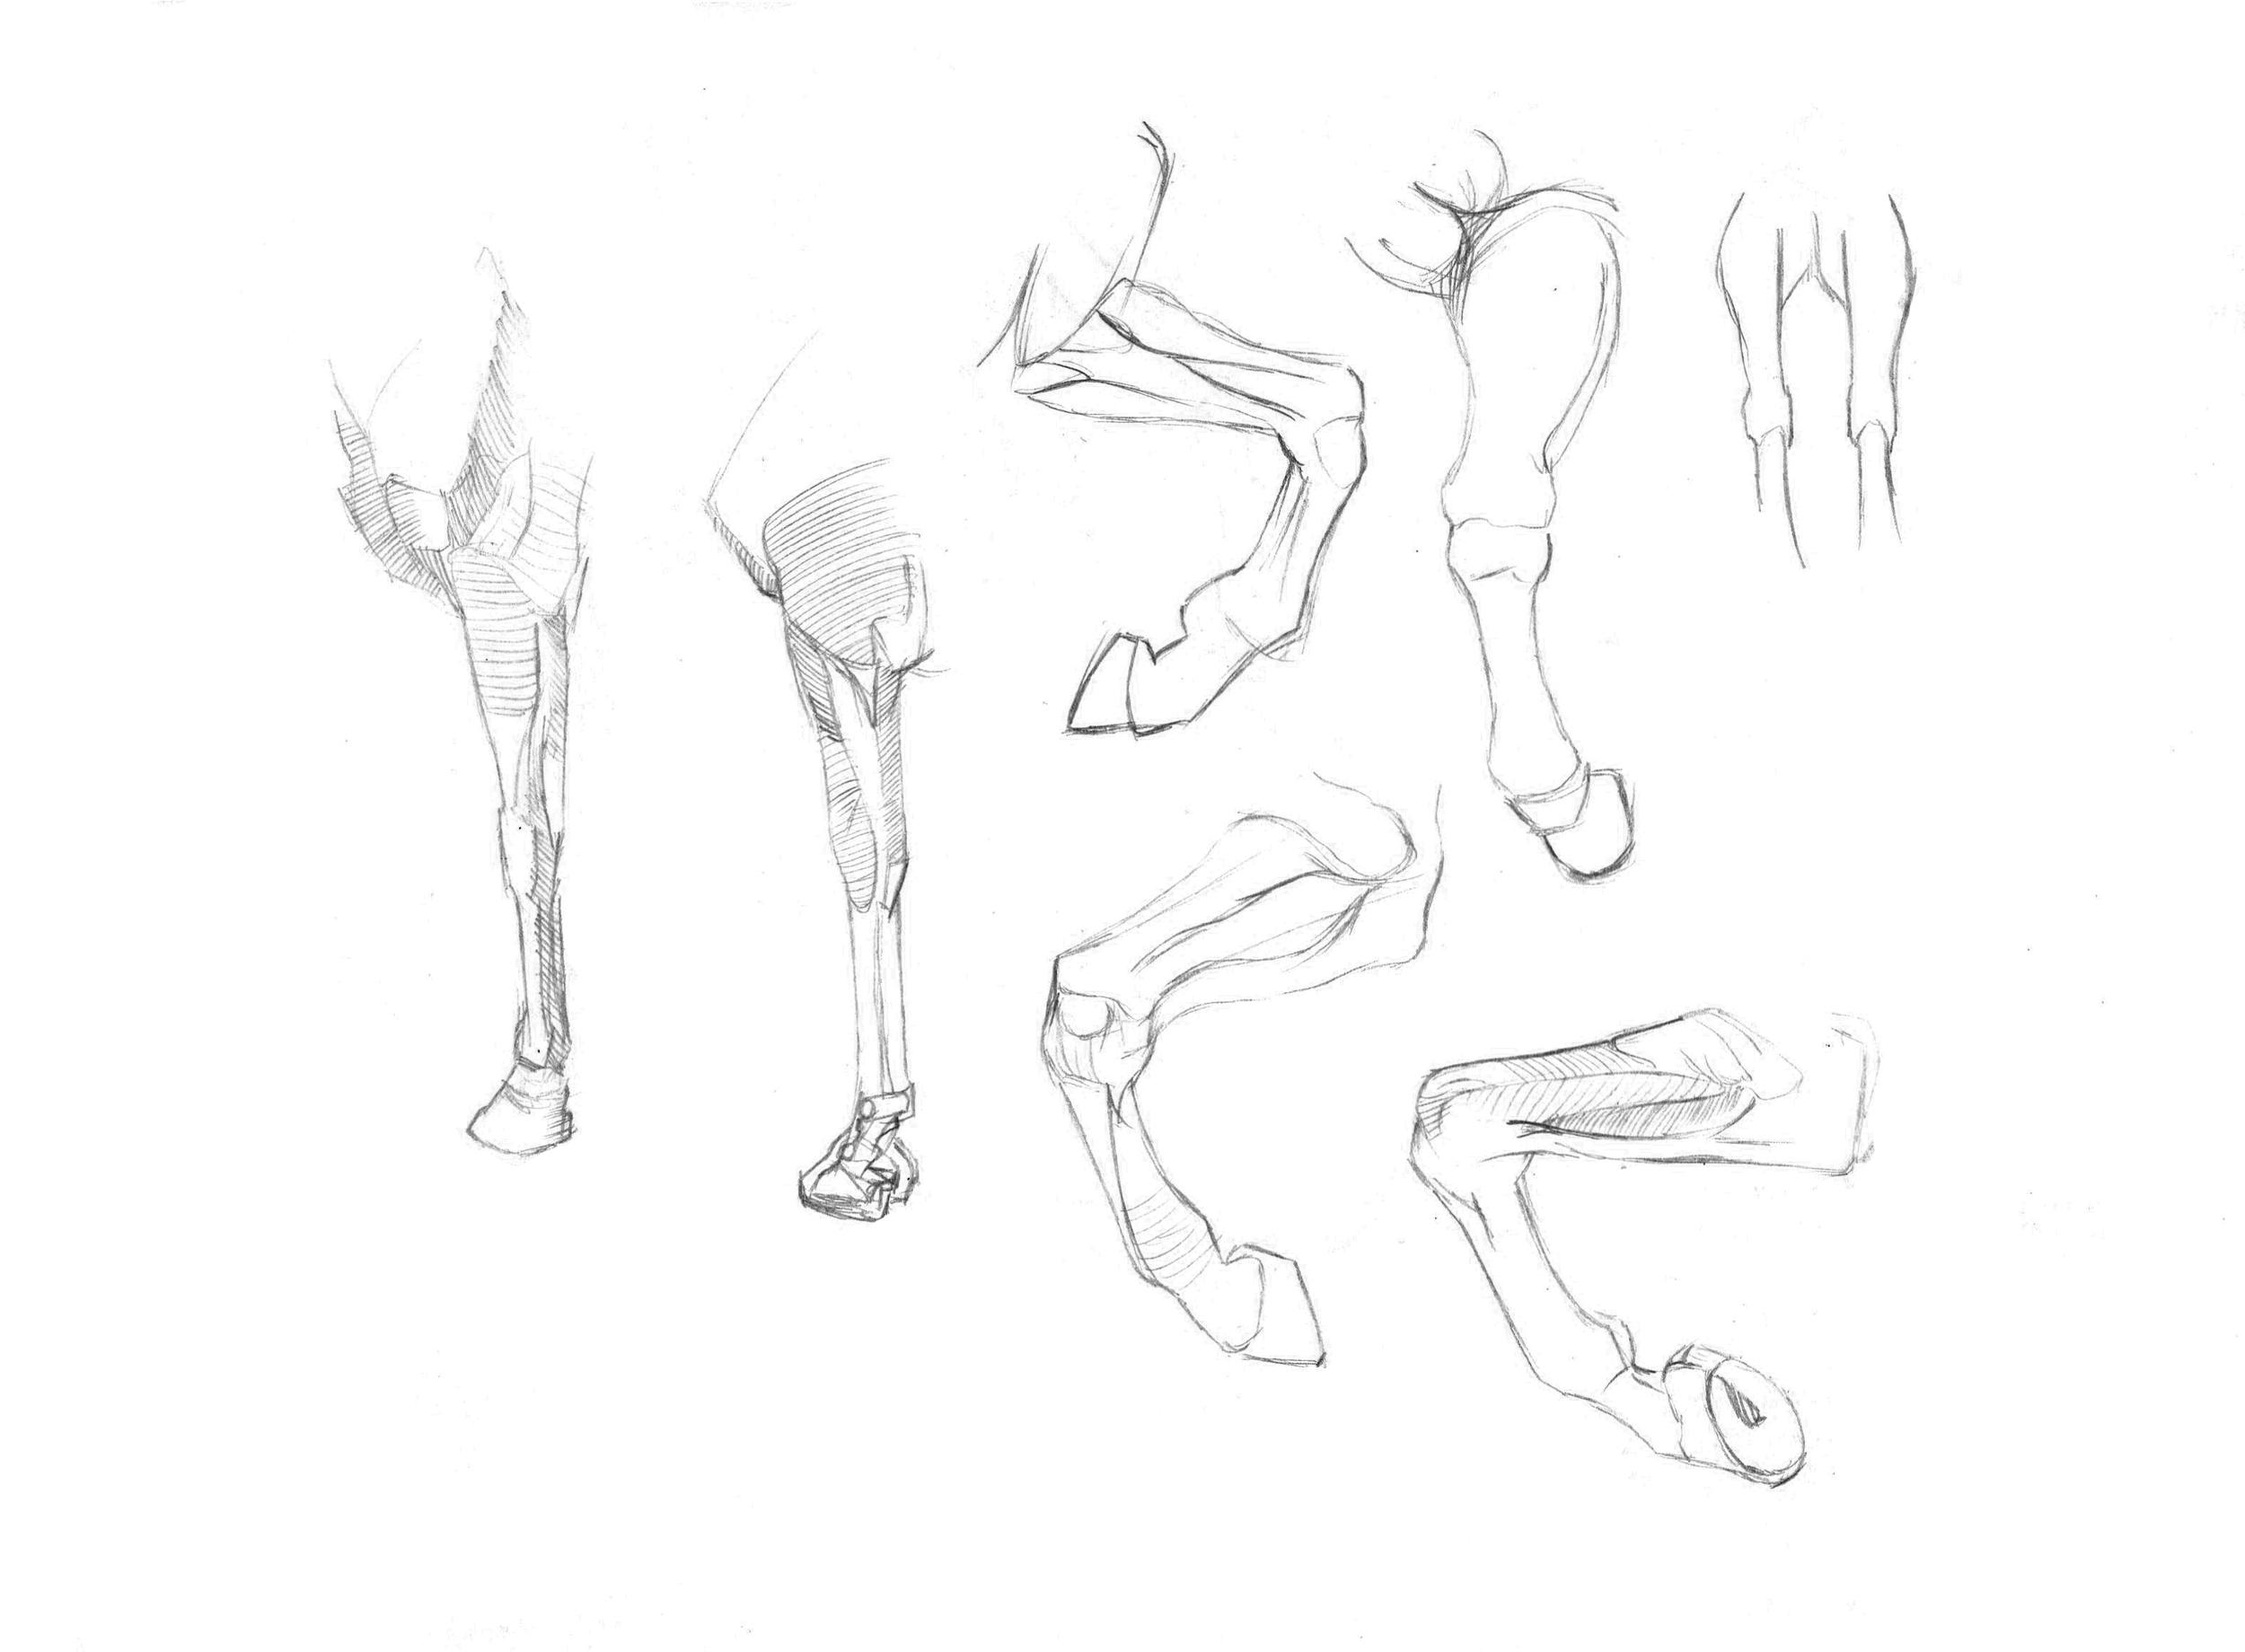 drawing10.jpg